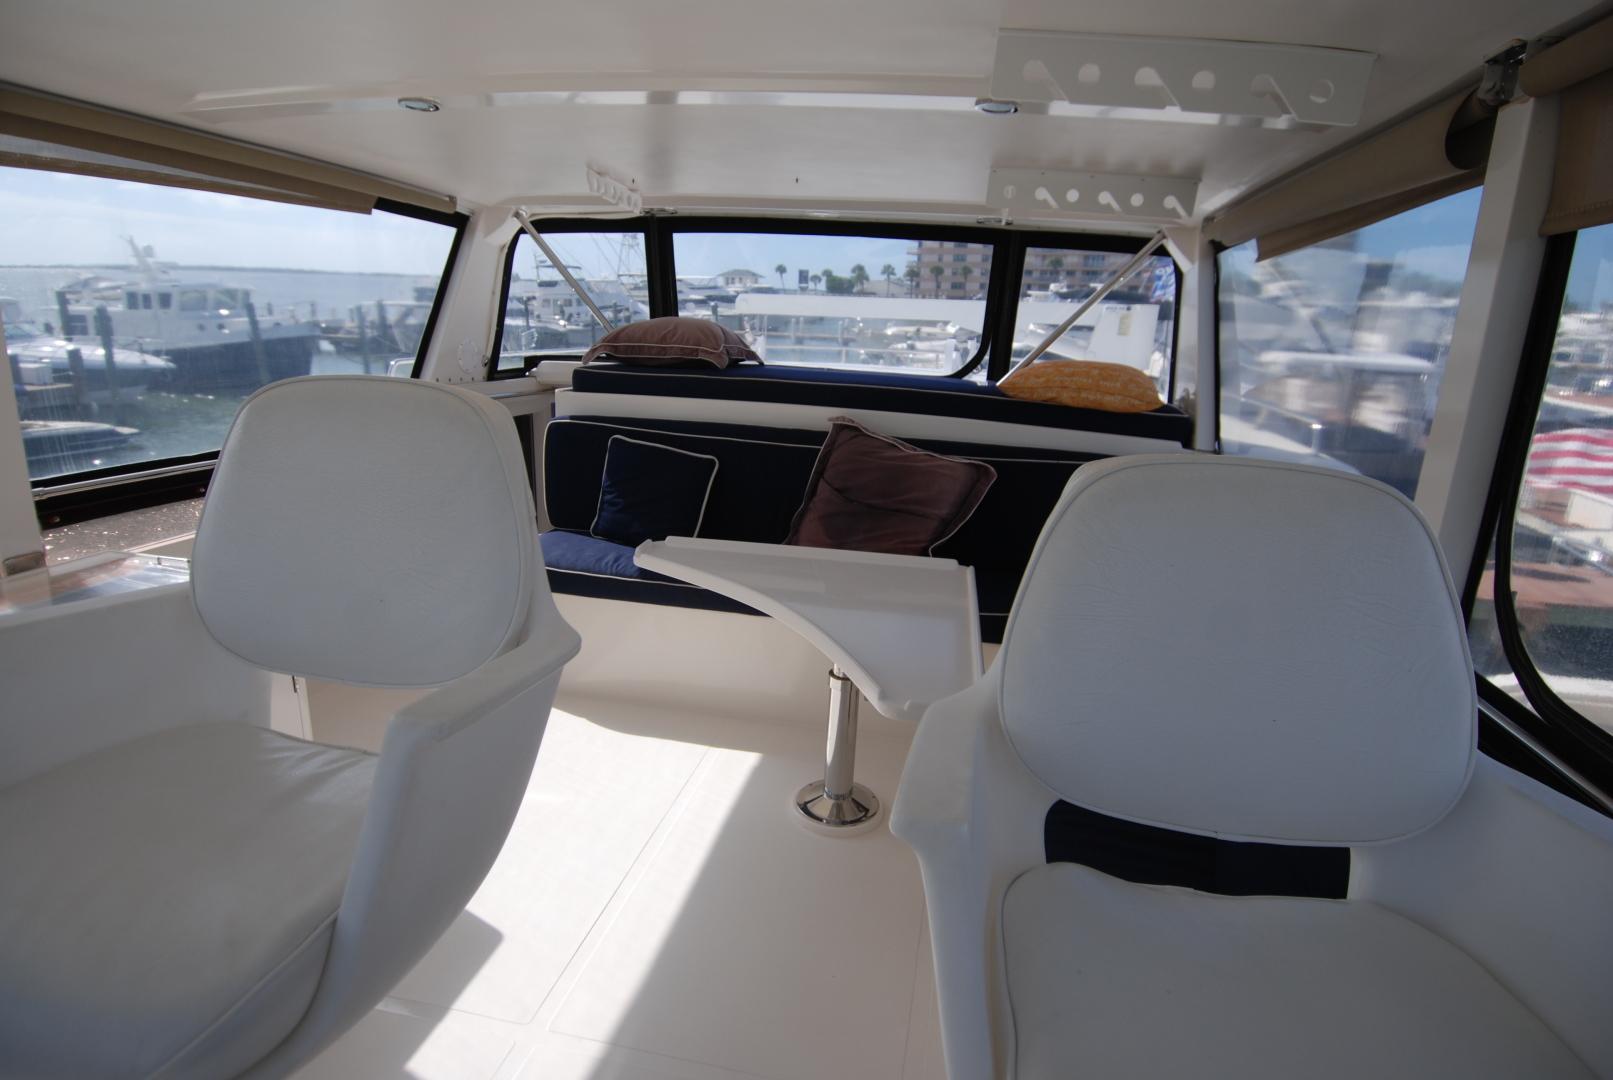 Novatec-Cockpit Motoryacht 2003-Liberty Dunedin-Florida-United States-1544780 | Thumbnail